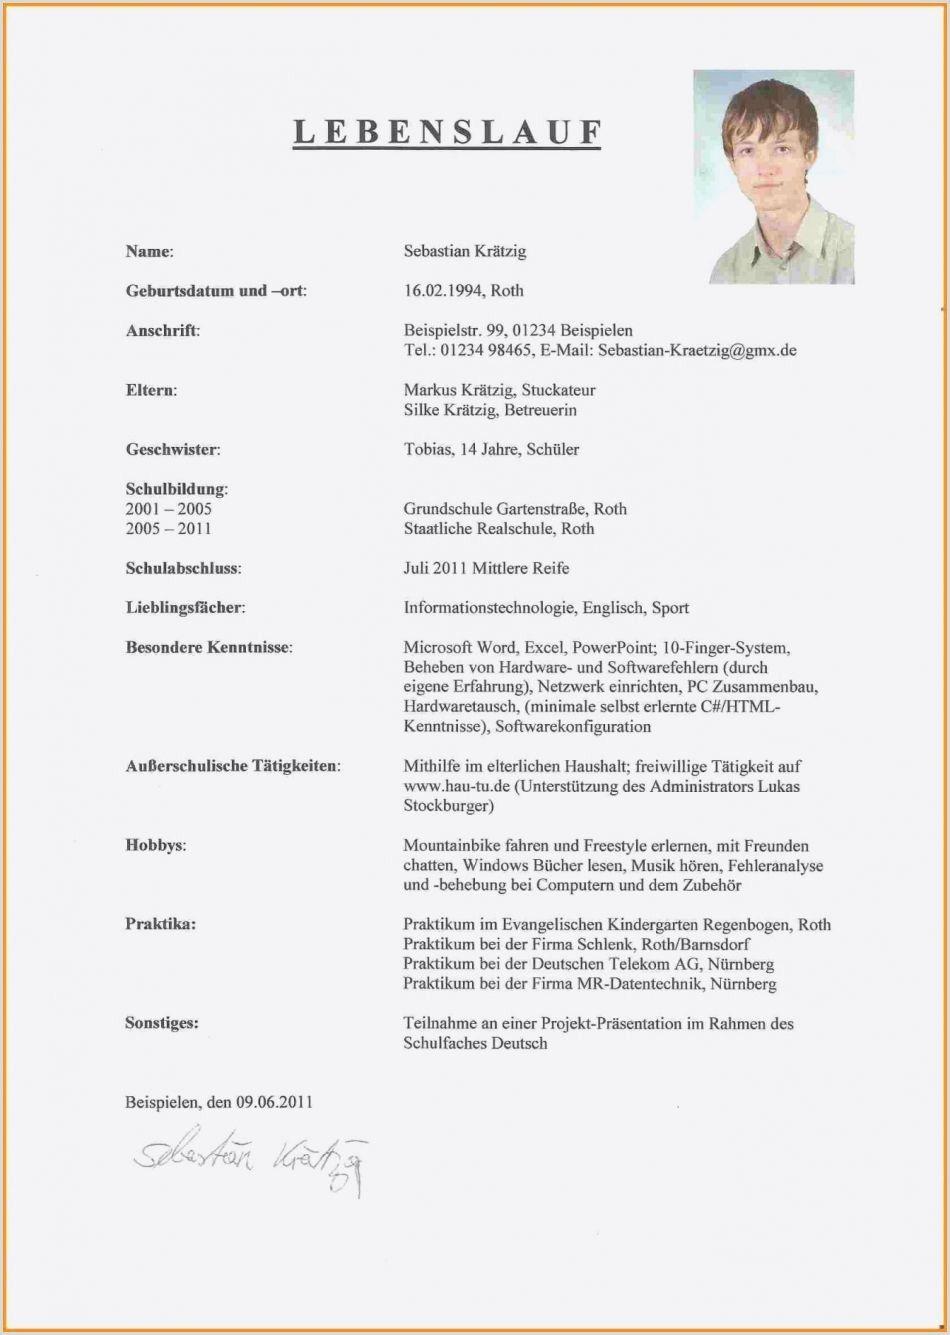 Lebenslauf Usa Muster Praktikum In 2020 Curriculum Vitae Curriculum Budget Planner